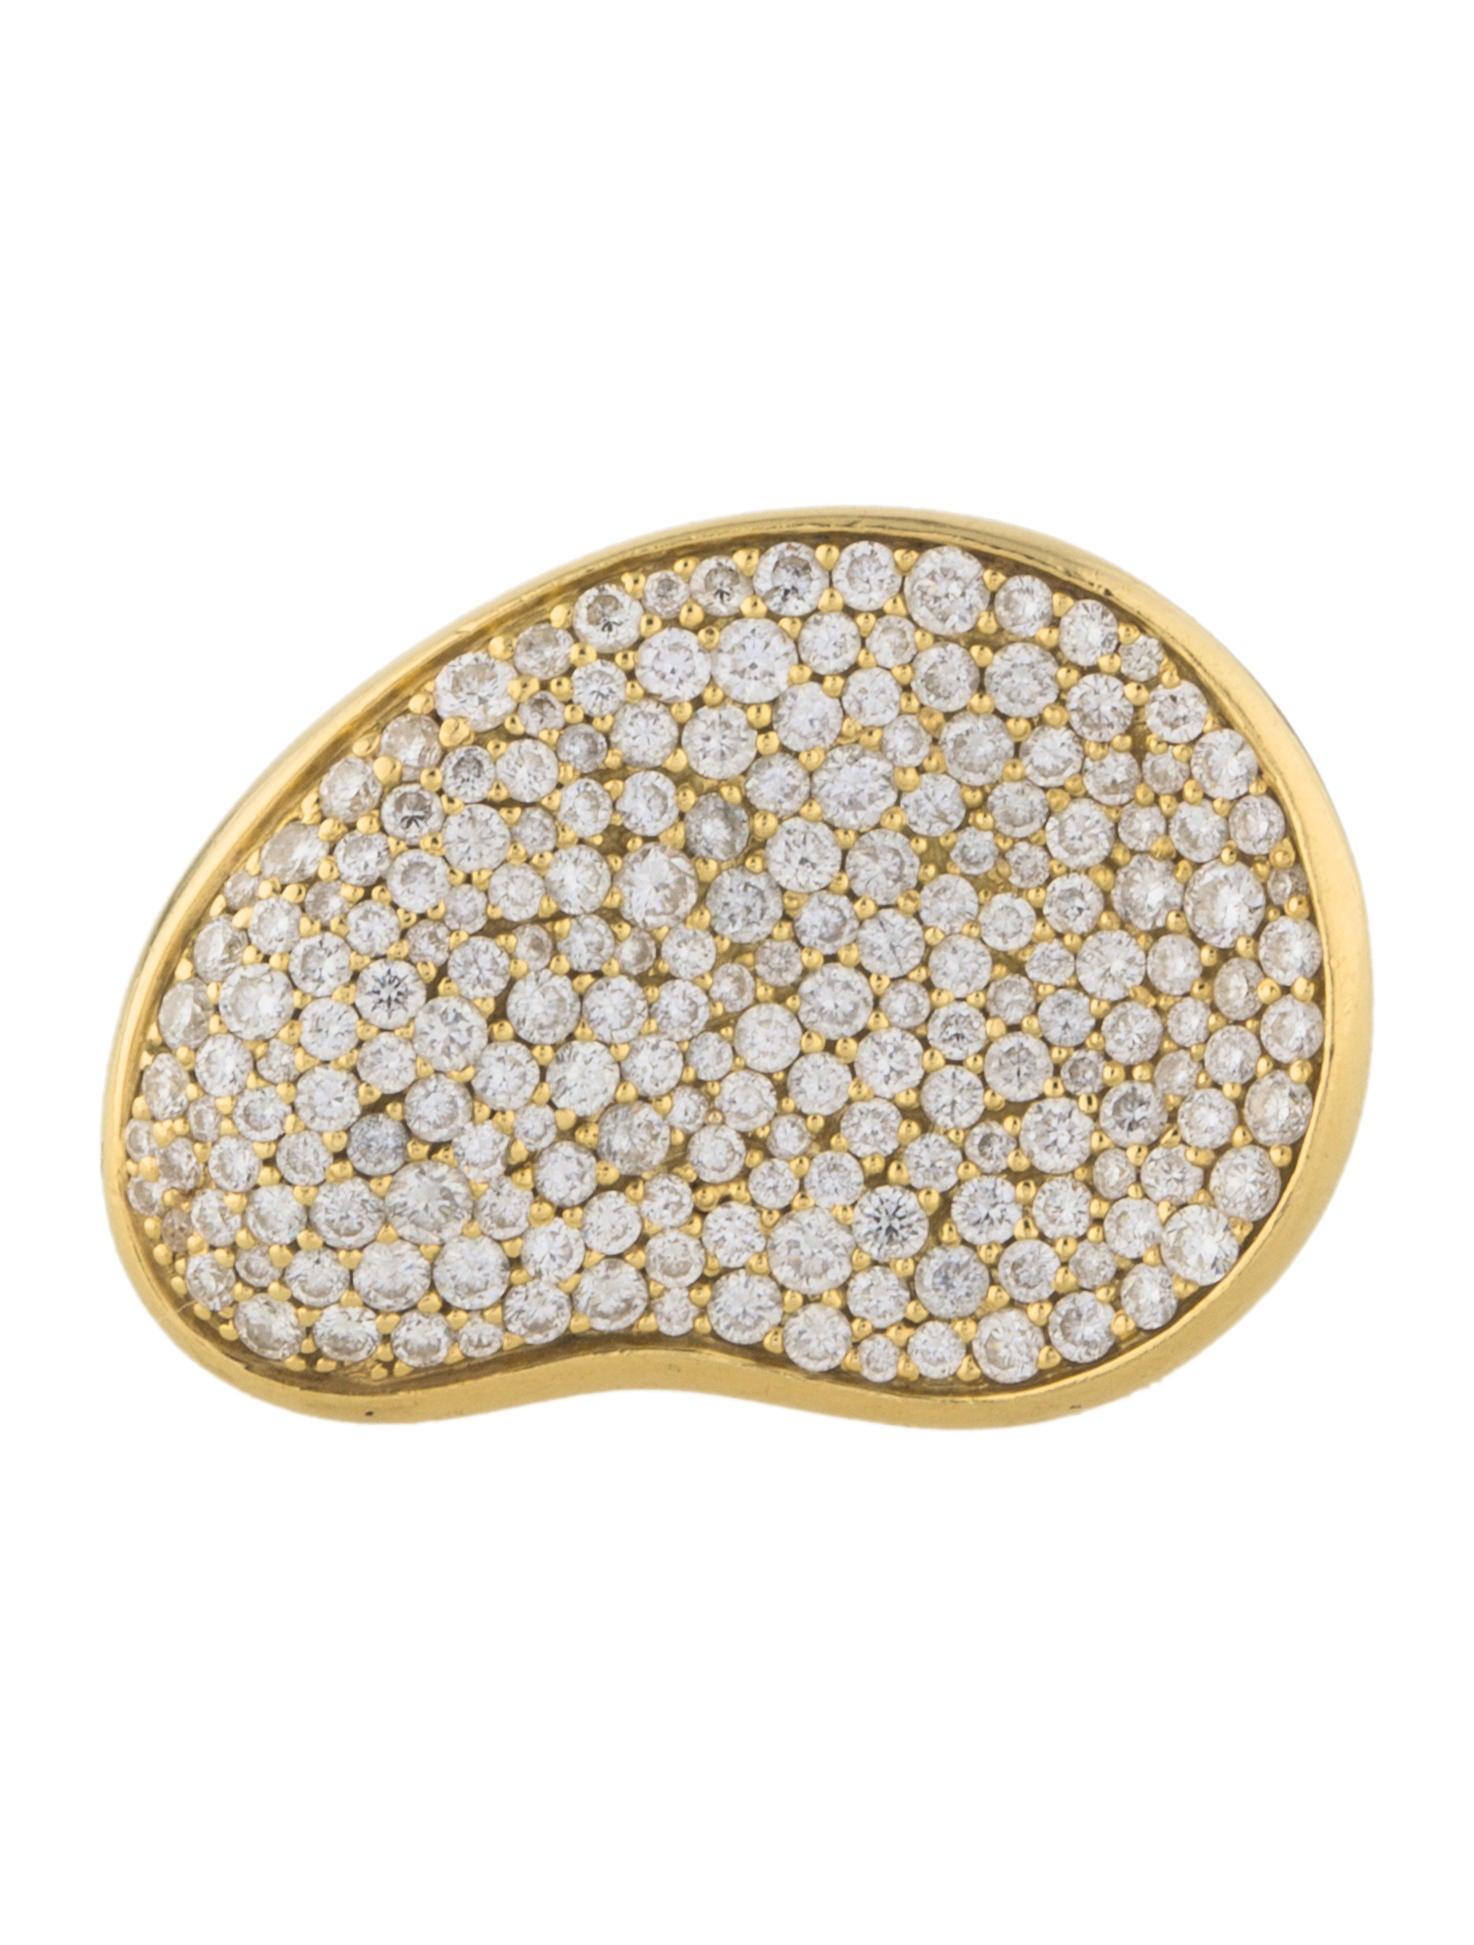 18k diamond stardust kidney bean ring